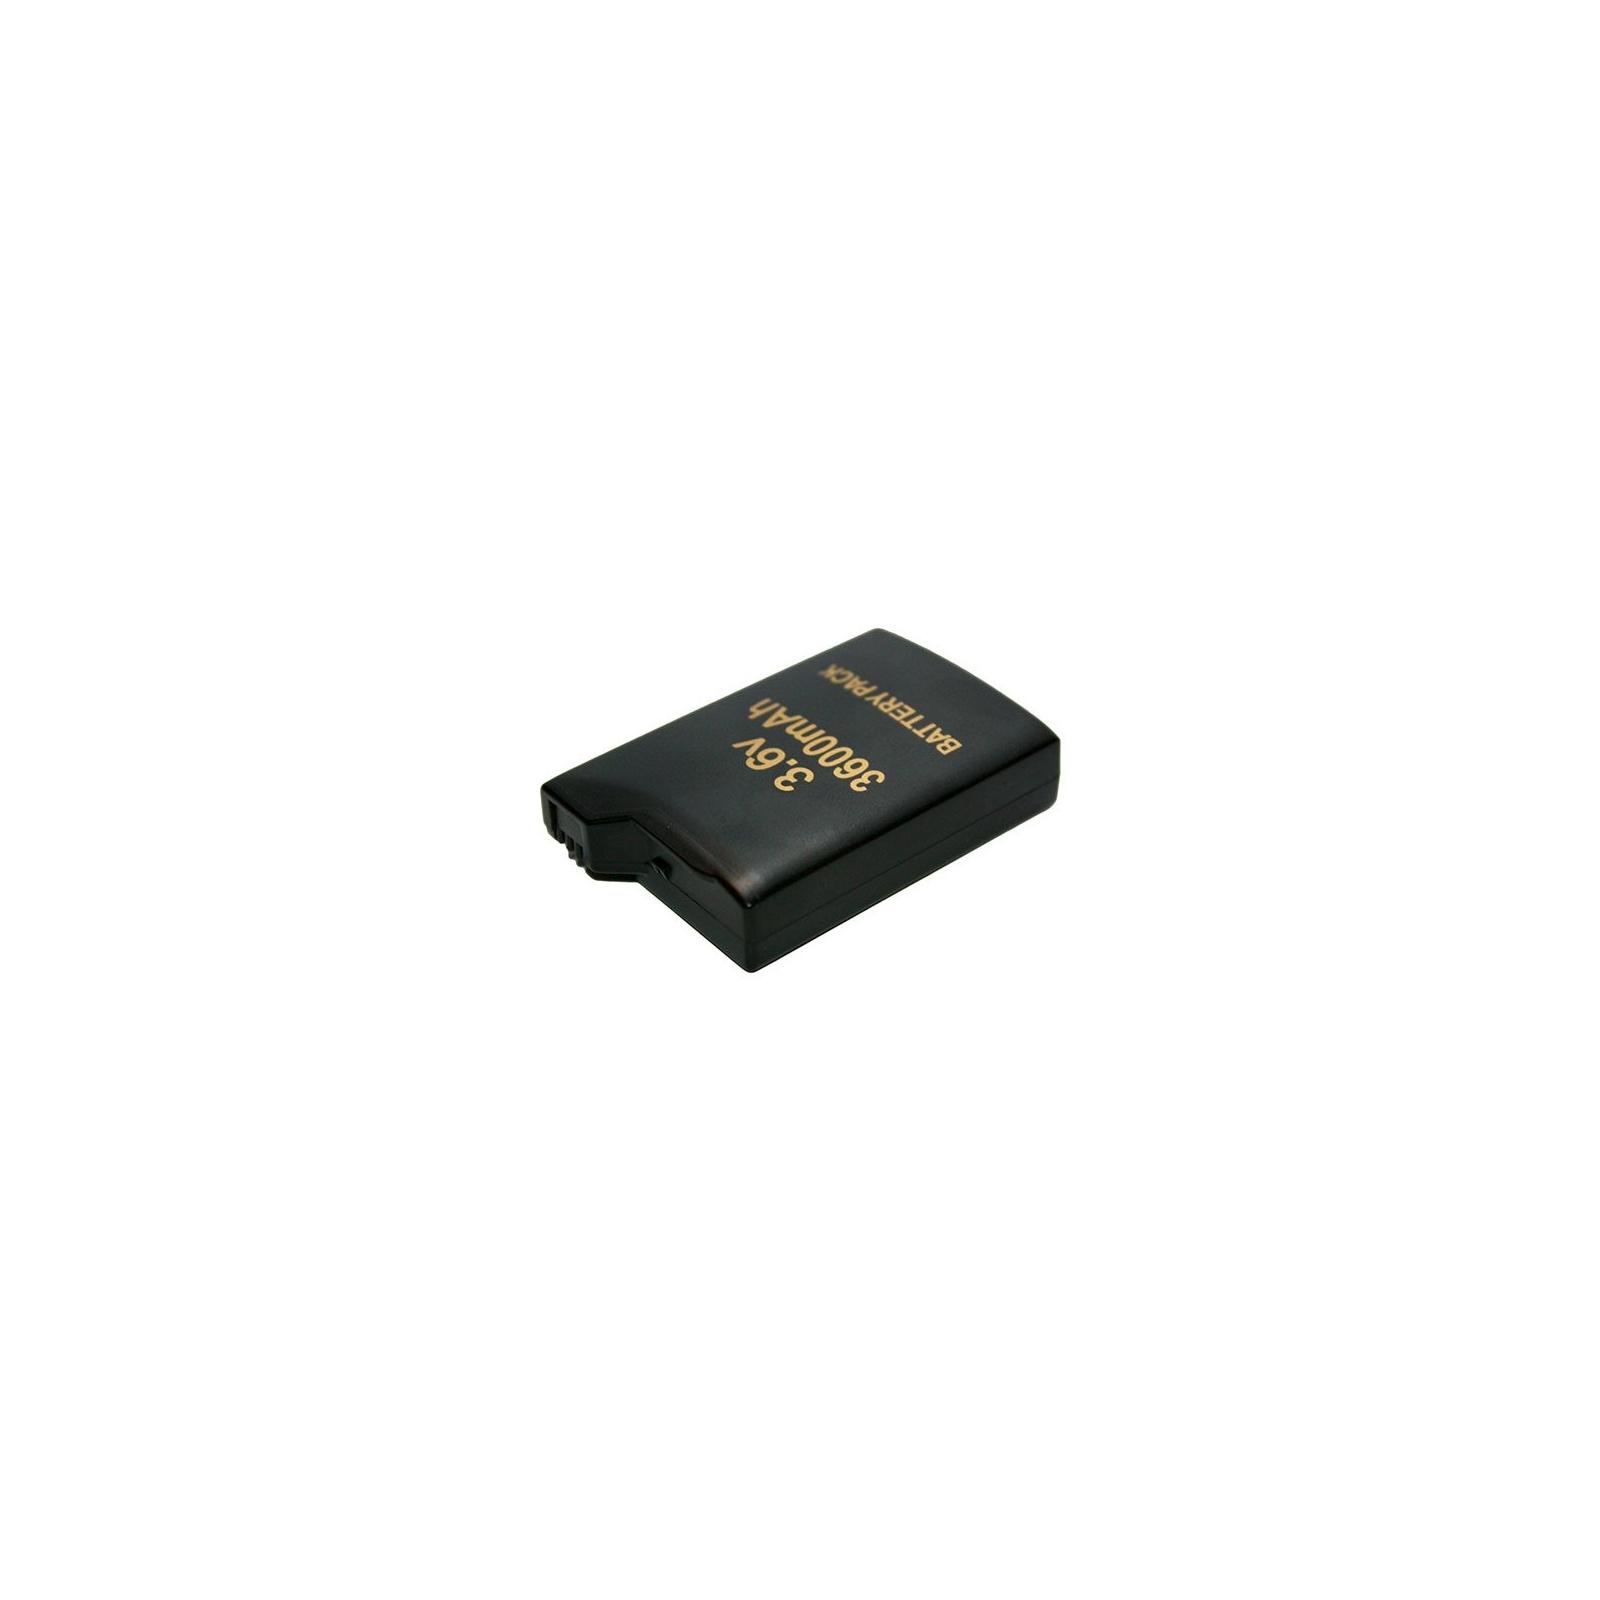 Аккумулятор к фото/видео EXTRADIGITAL Sony PSP-110 (DV00DV1351) изображение 3